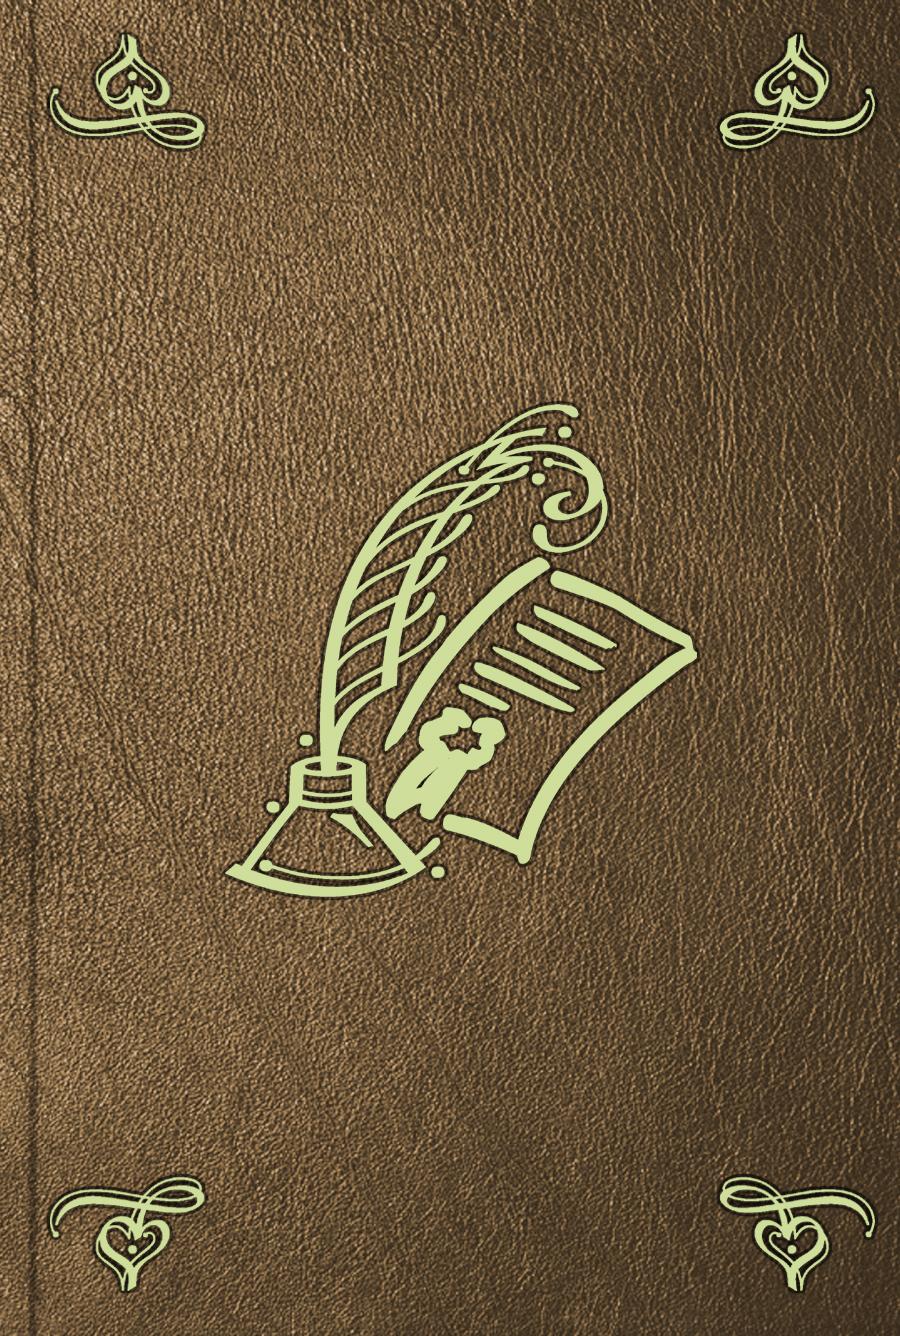 Капитон Бочарников Краткое описание российскаго торга cd158 1 free shipping hot sale fashion design shoes and matching bag with glitter item in black